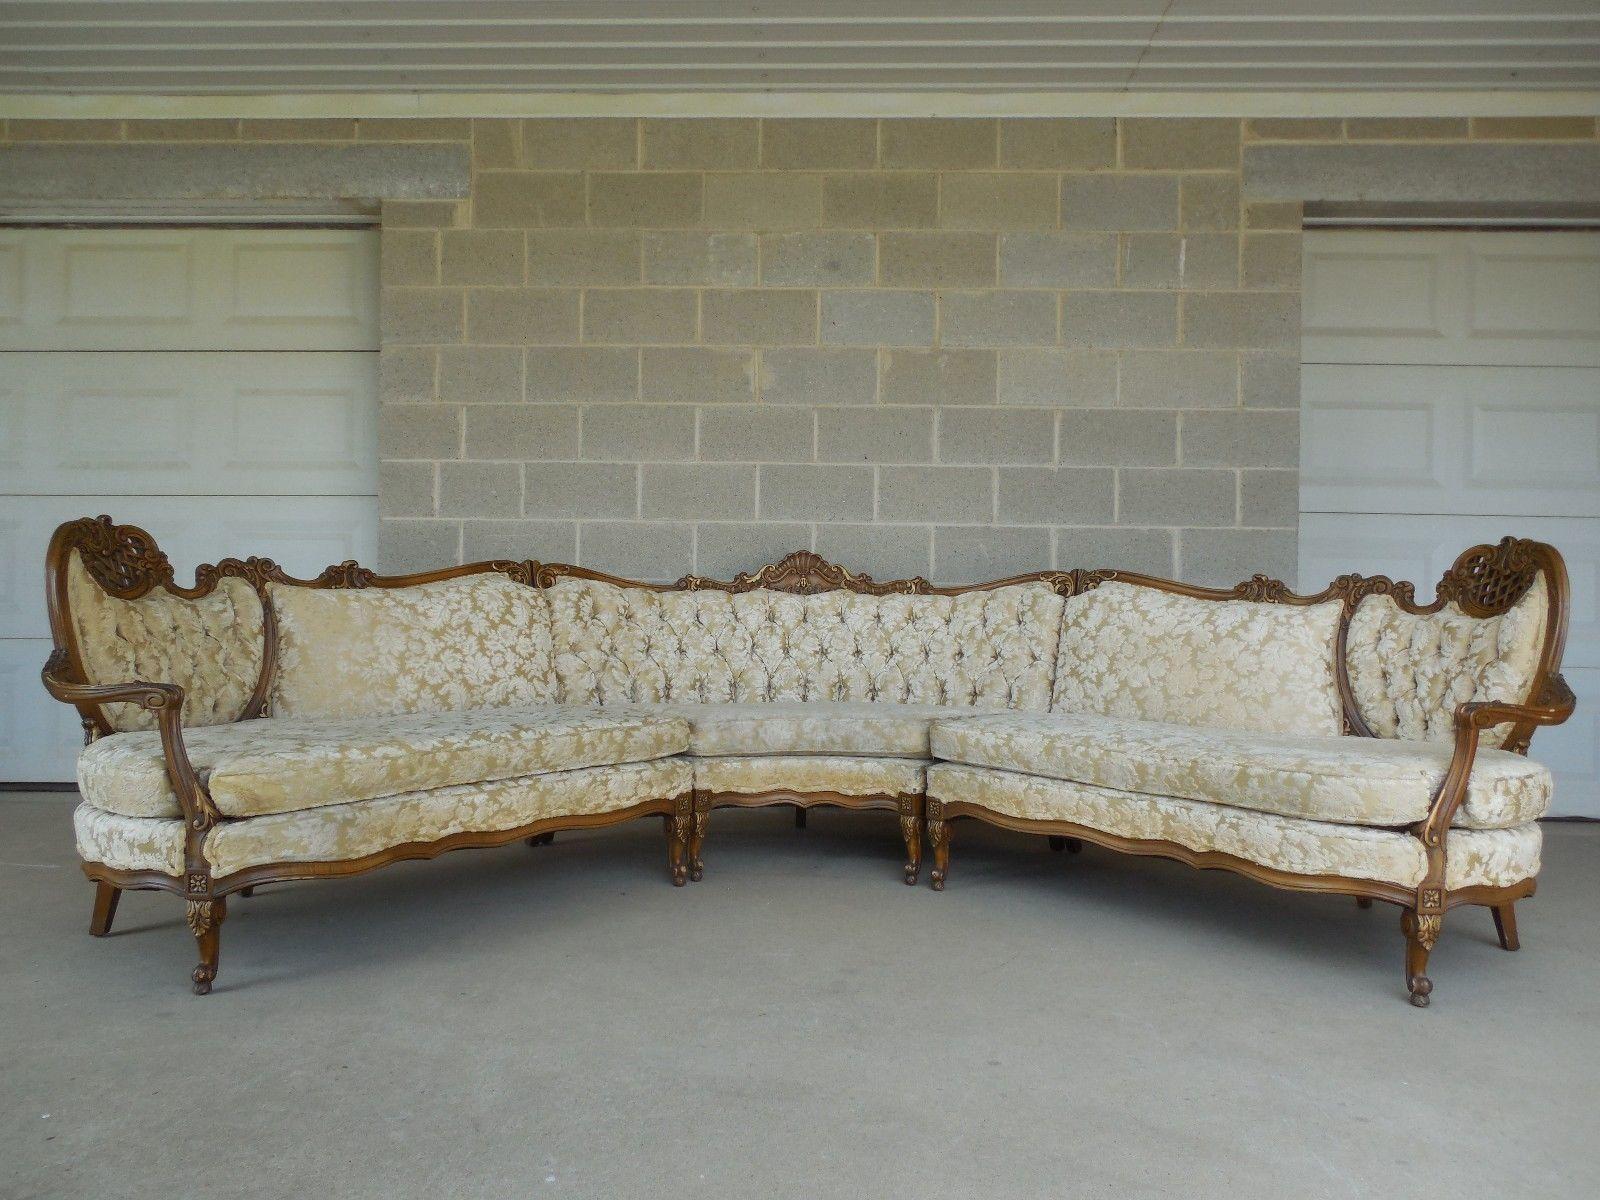 antique french sofa ebay lazy boy greyson leather reclining vintage corner oslo scandinavian